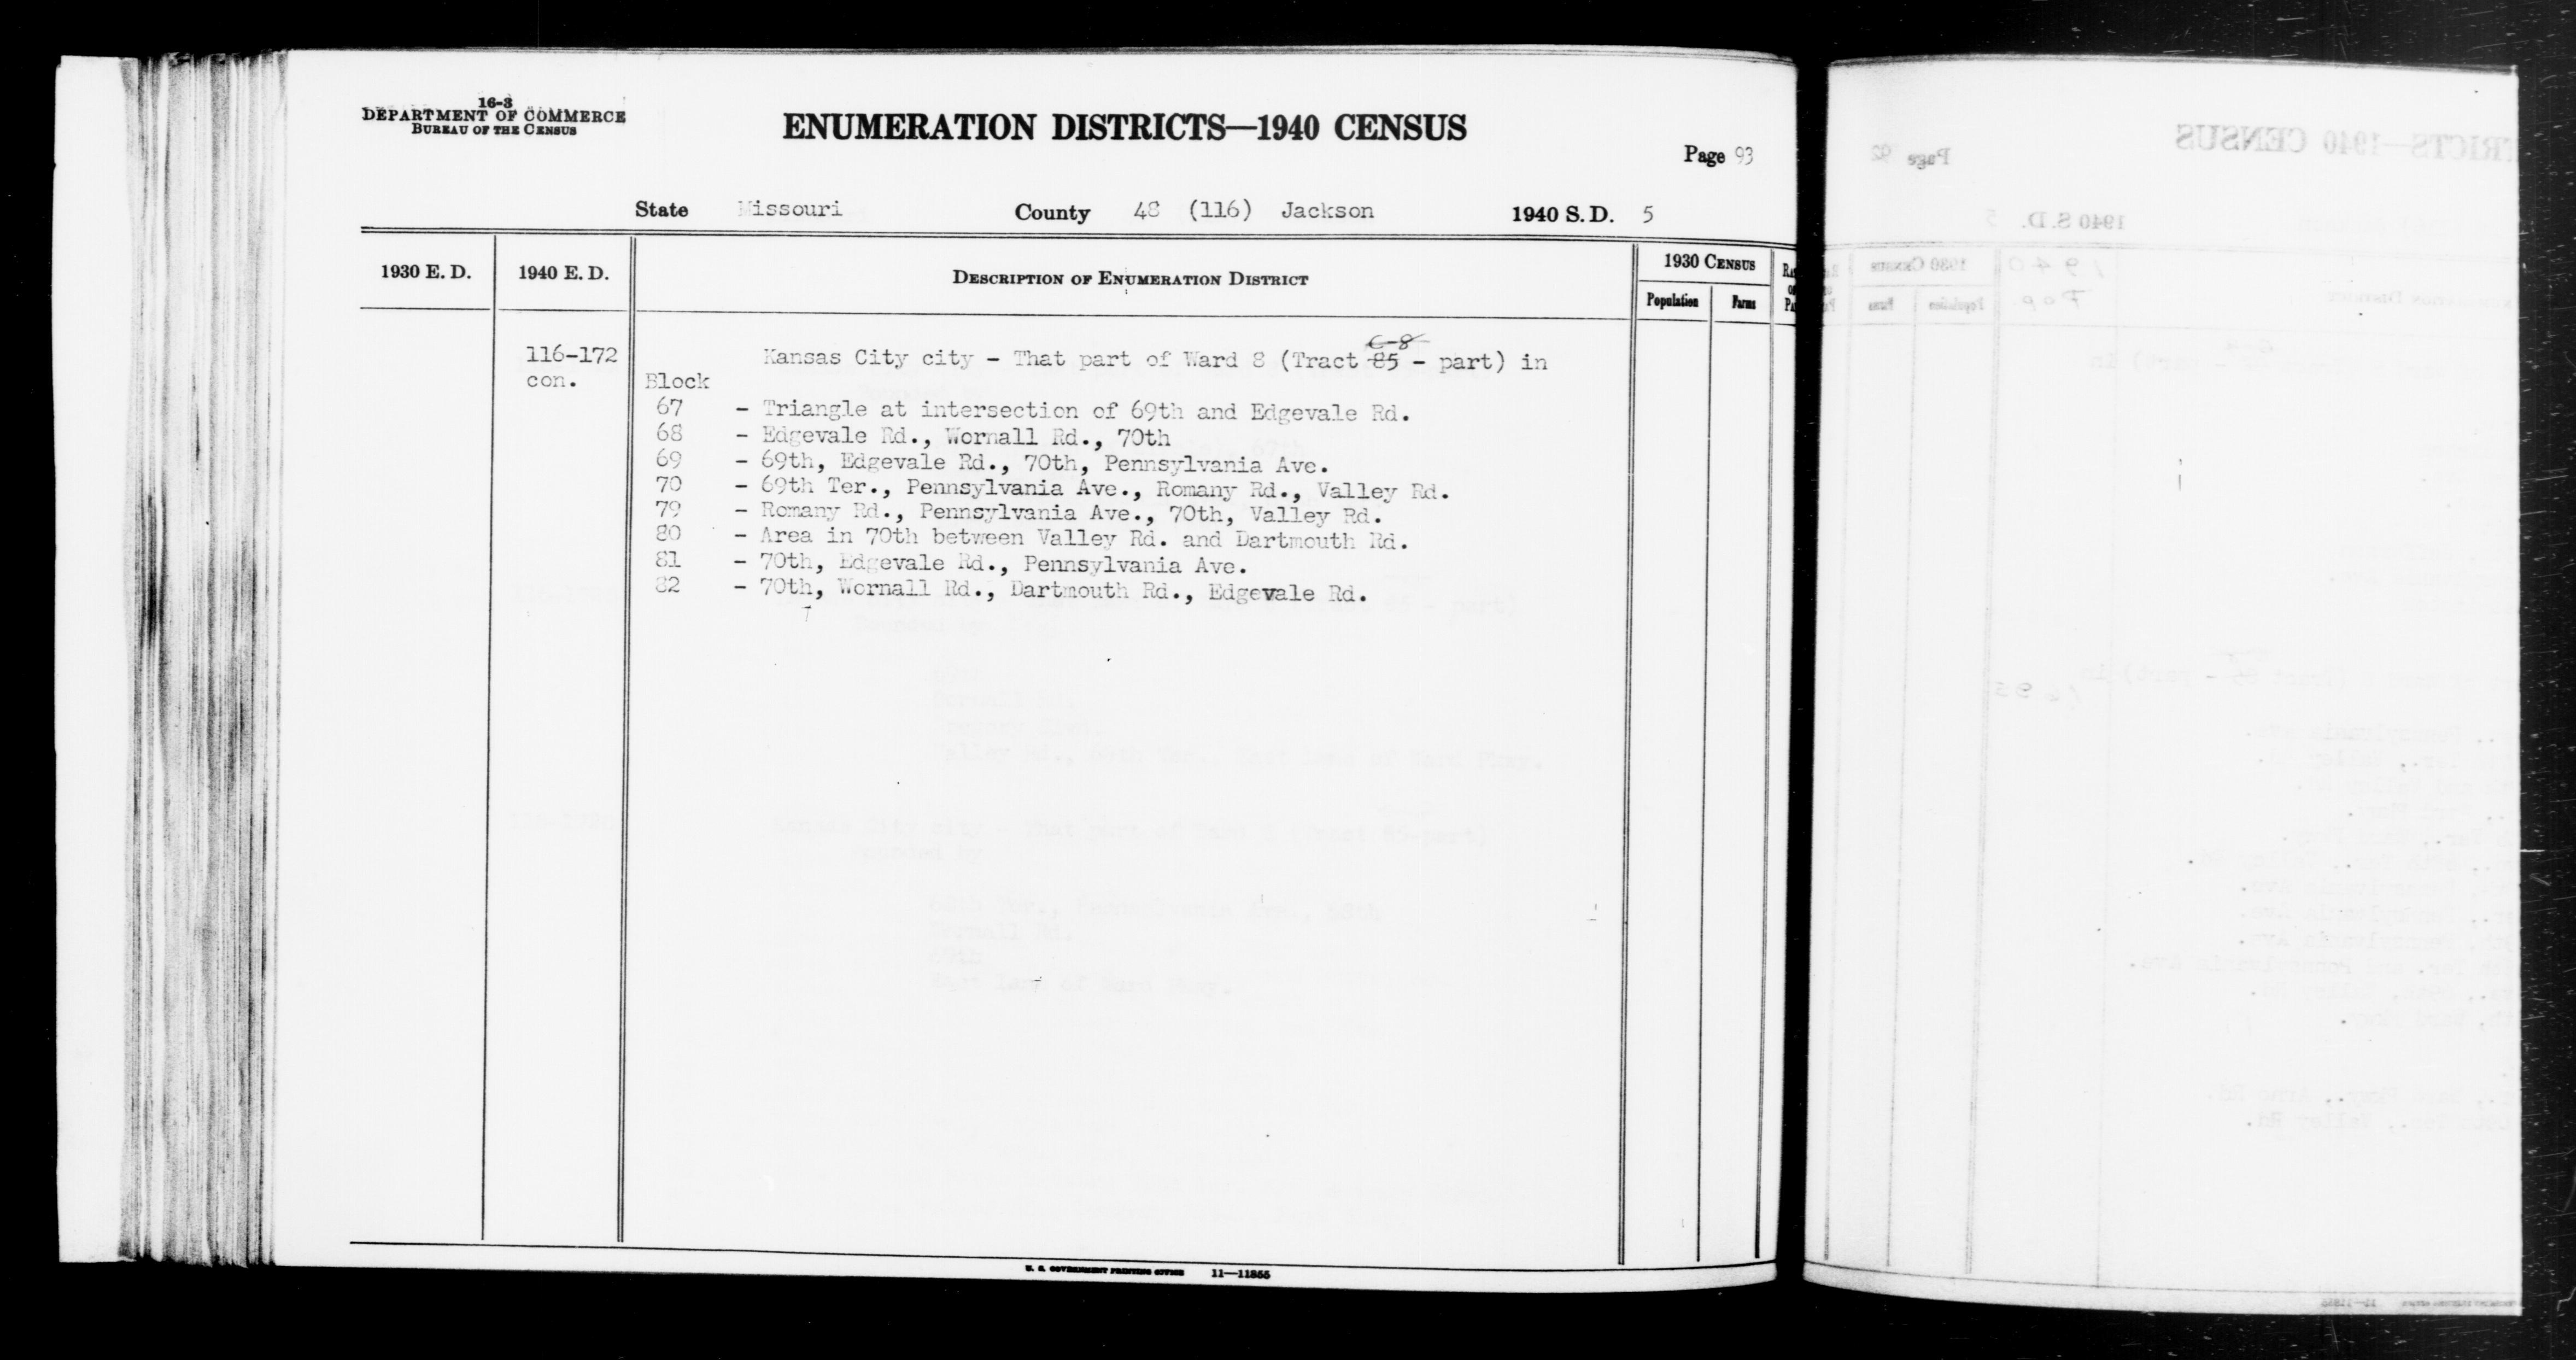 1940 Census Enumeration District Descriptions - Missouri - Jackson County - ED 116-172A, ED 116-172B, ED 116-172C